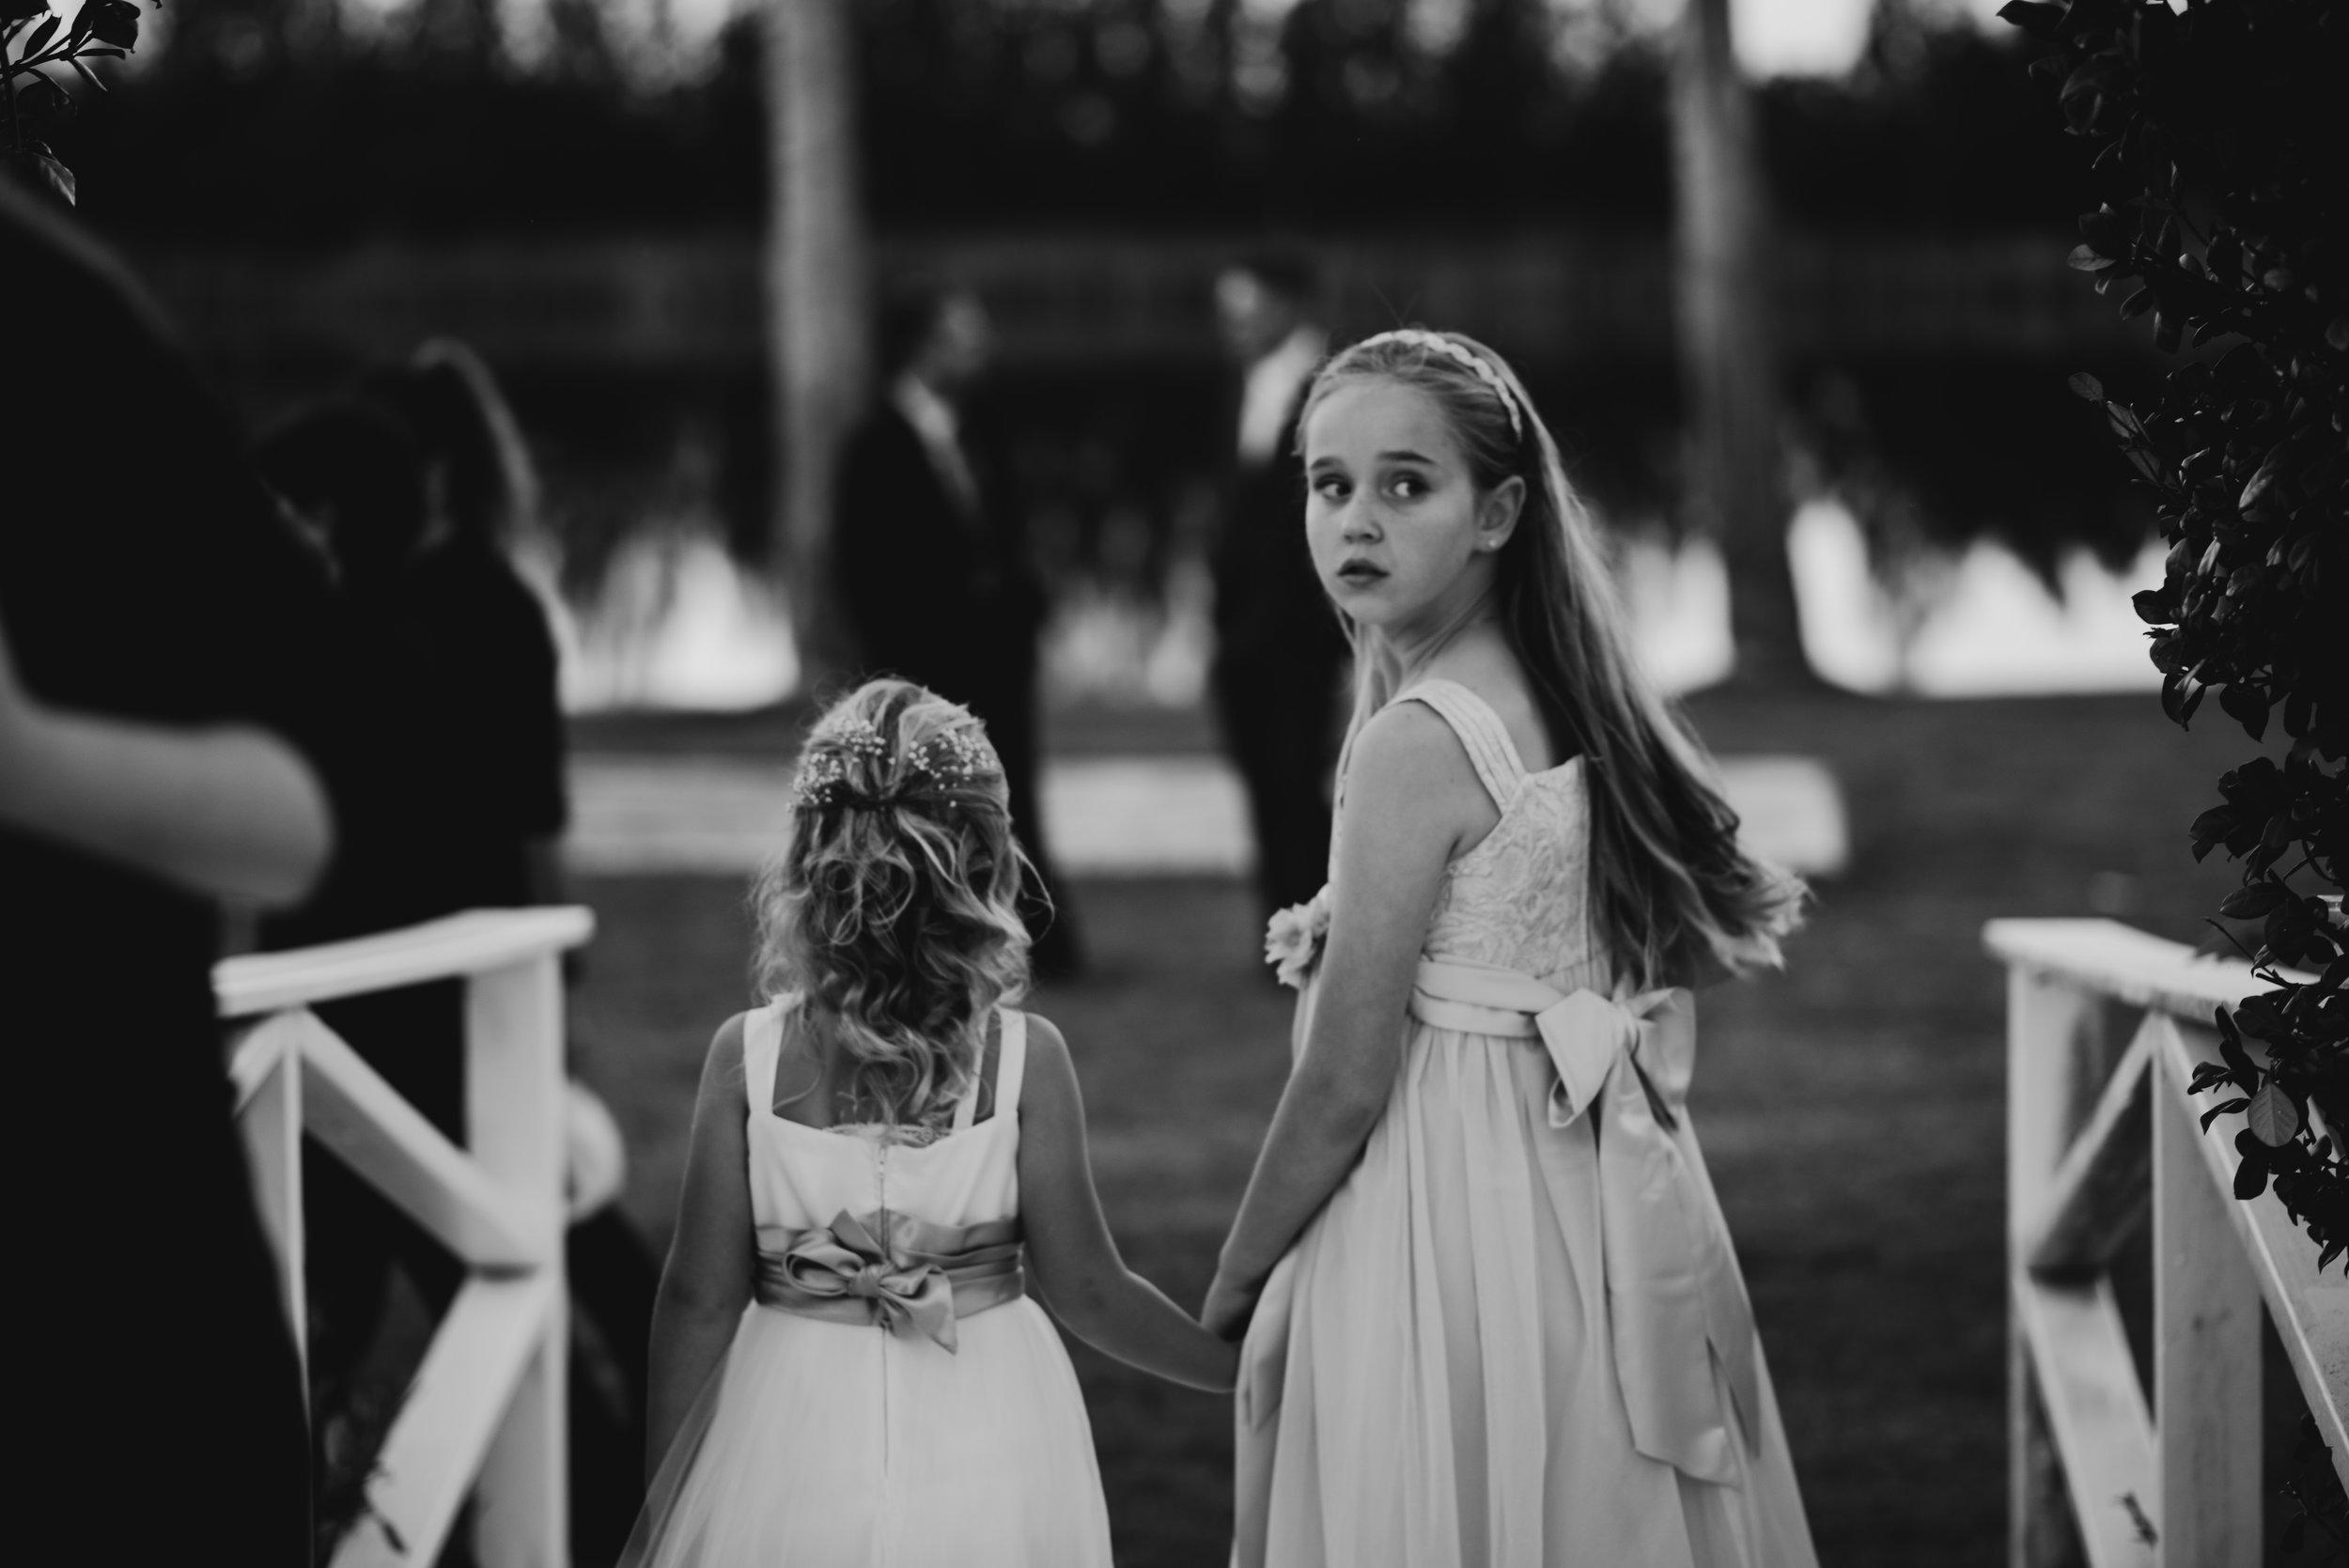 micayla-greyson-neumann-vero-beach-lake-house-winter-white-wedding-photography-1092.jpg